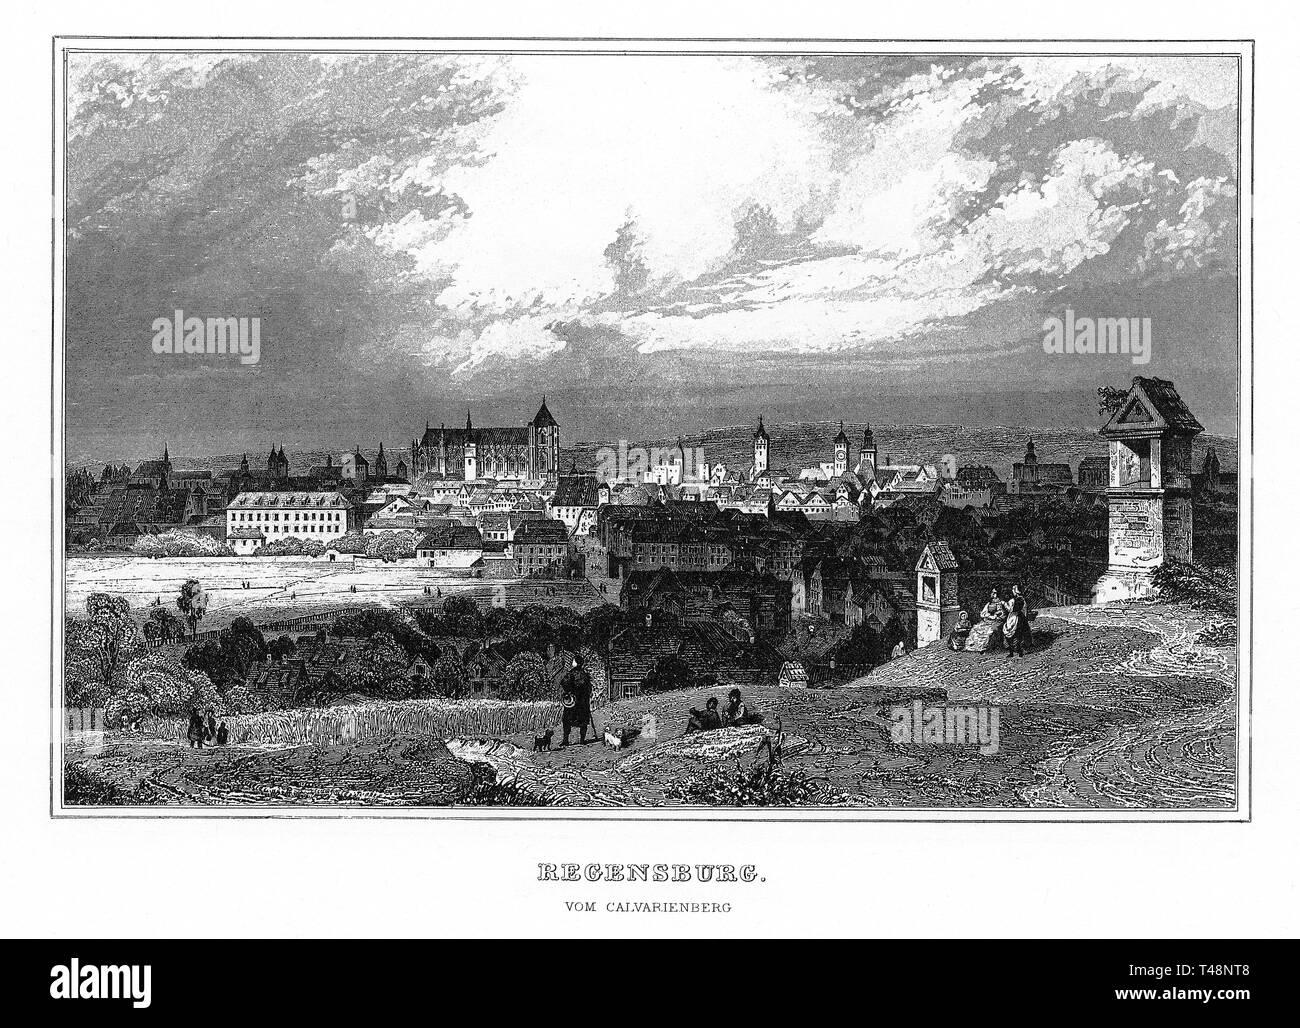 Regensburg vom Calvarienbverg, steel engraving from 1840-1854, Kingdom of Bavaria, Germany - Stock Image